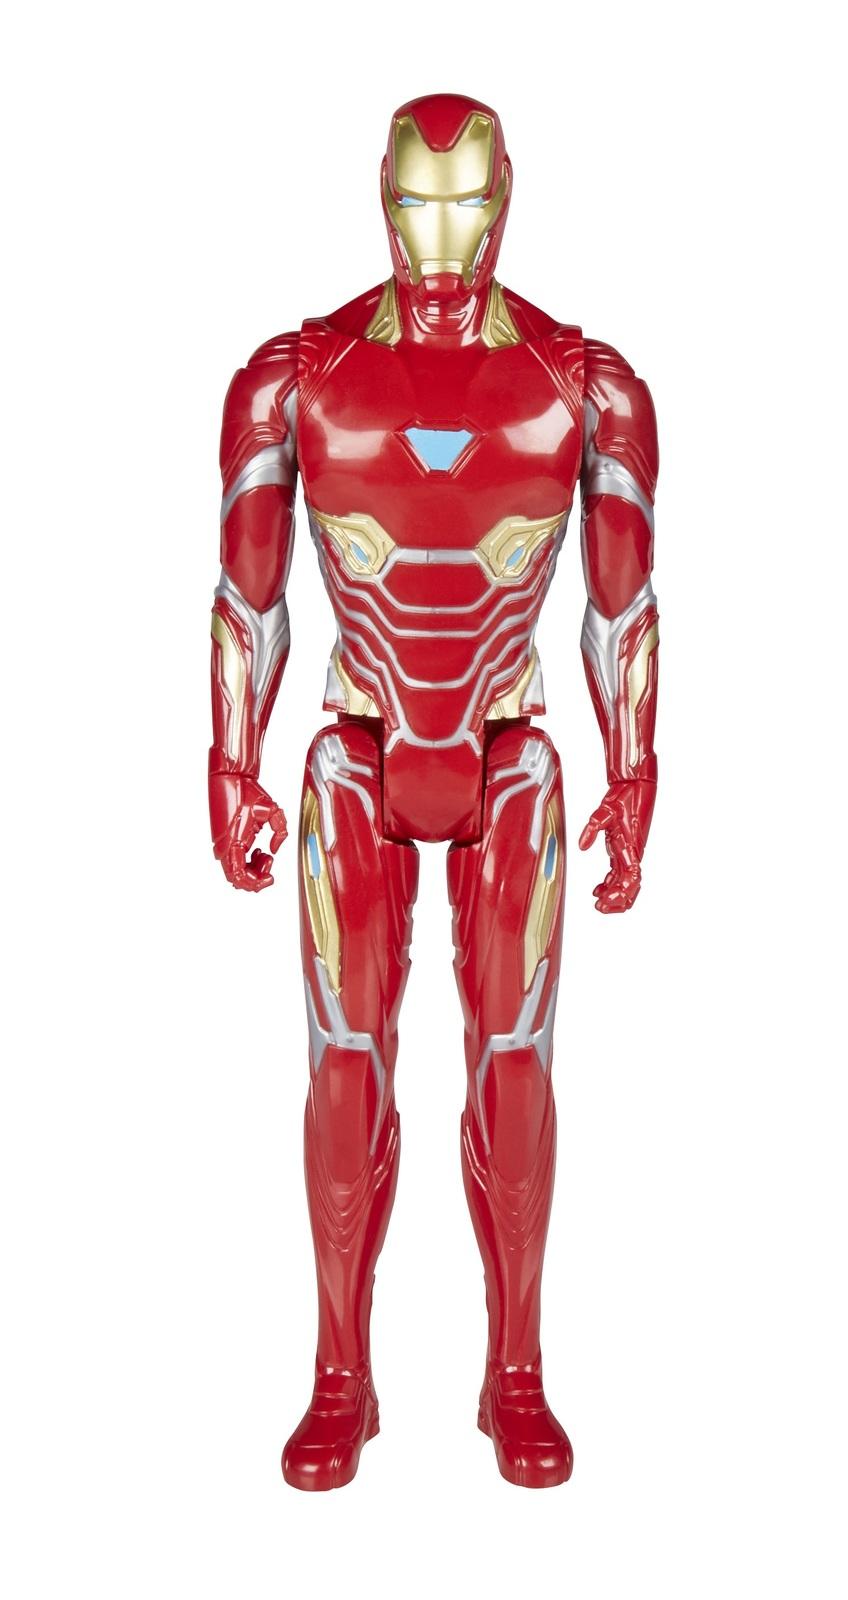 "Avengers Infinity War: Power FX Iron-Man - 12"" Titan Hero Figure image"